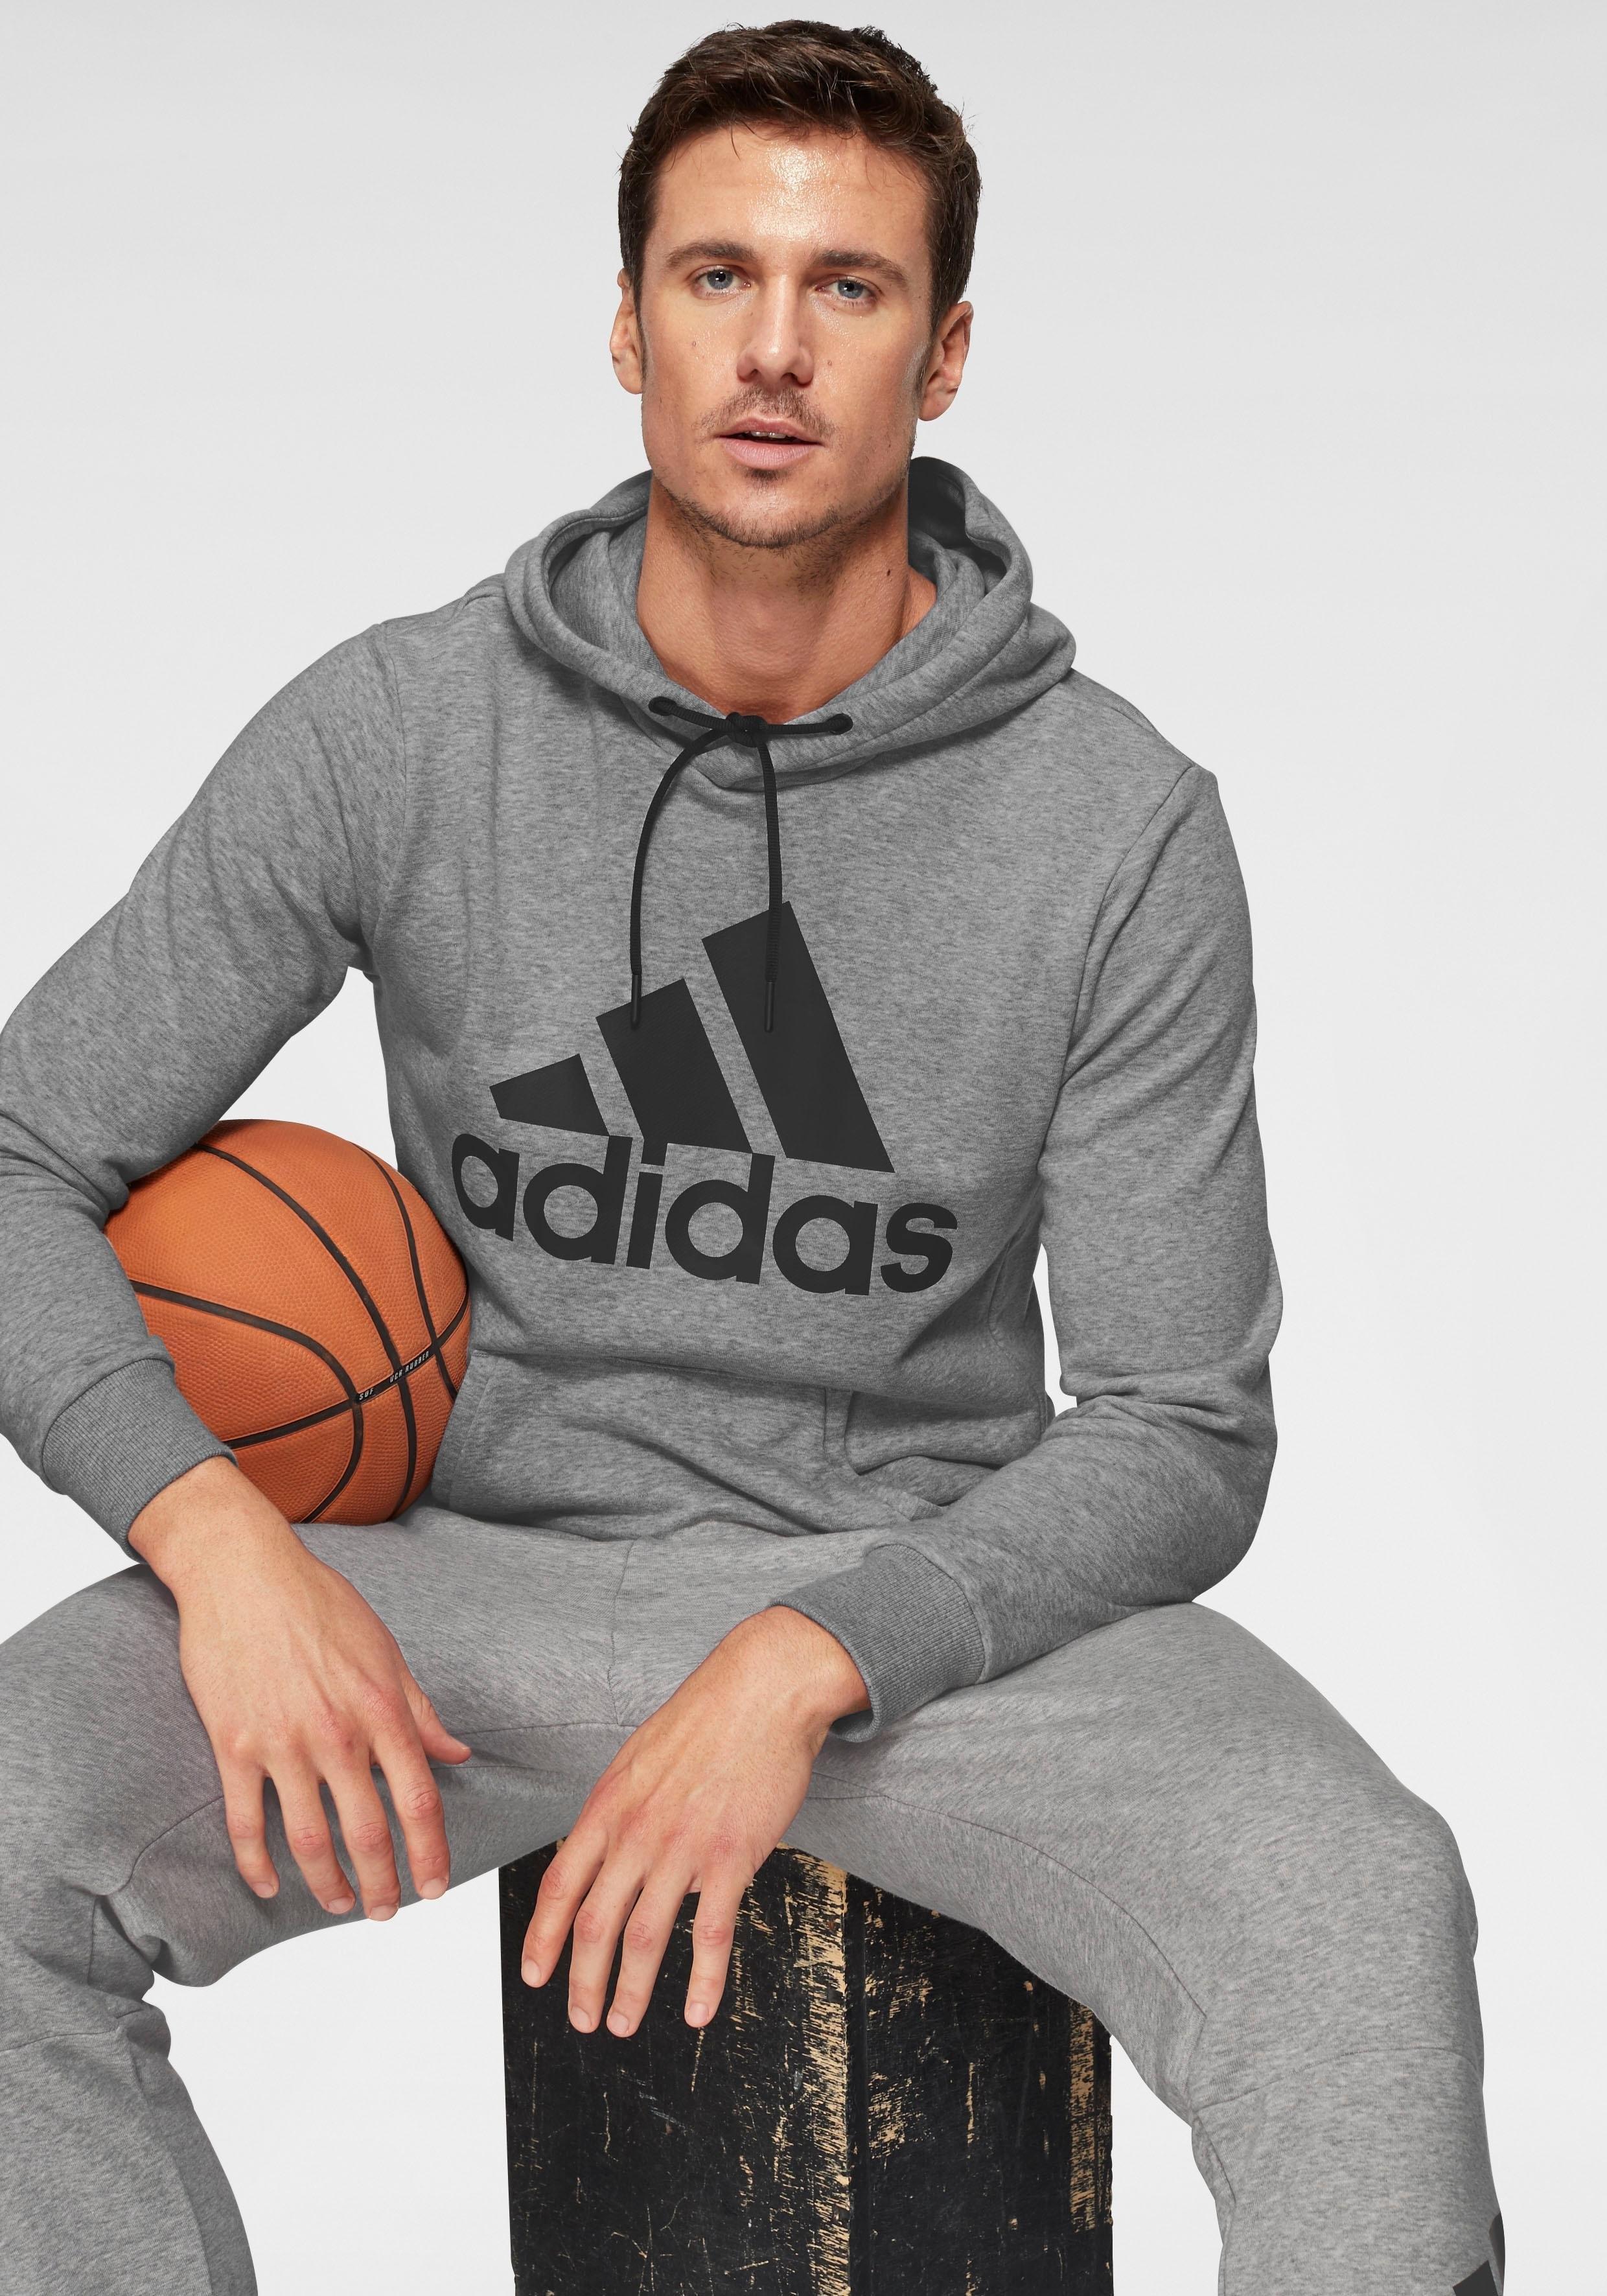 adidas Performance hoodie »MEN HOOD BOS PO FT« voordelig en veilig online kopen